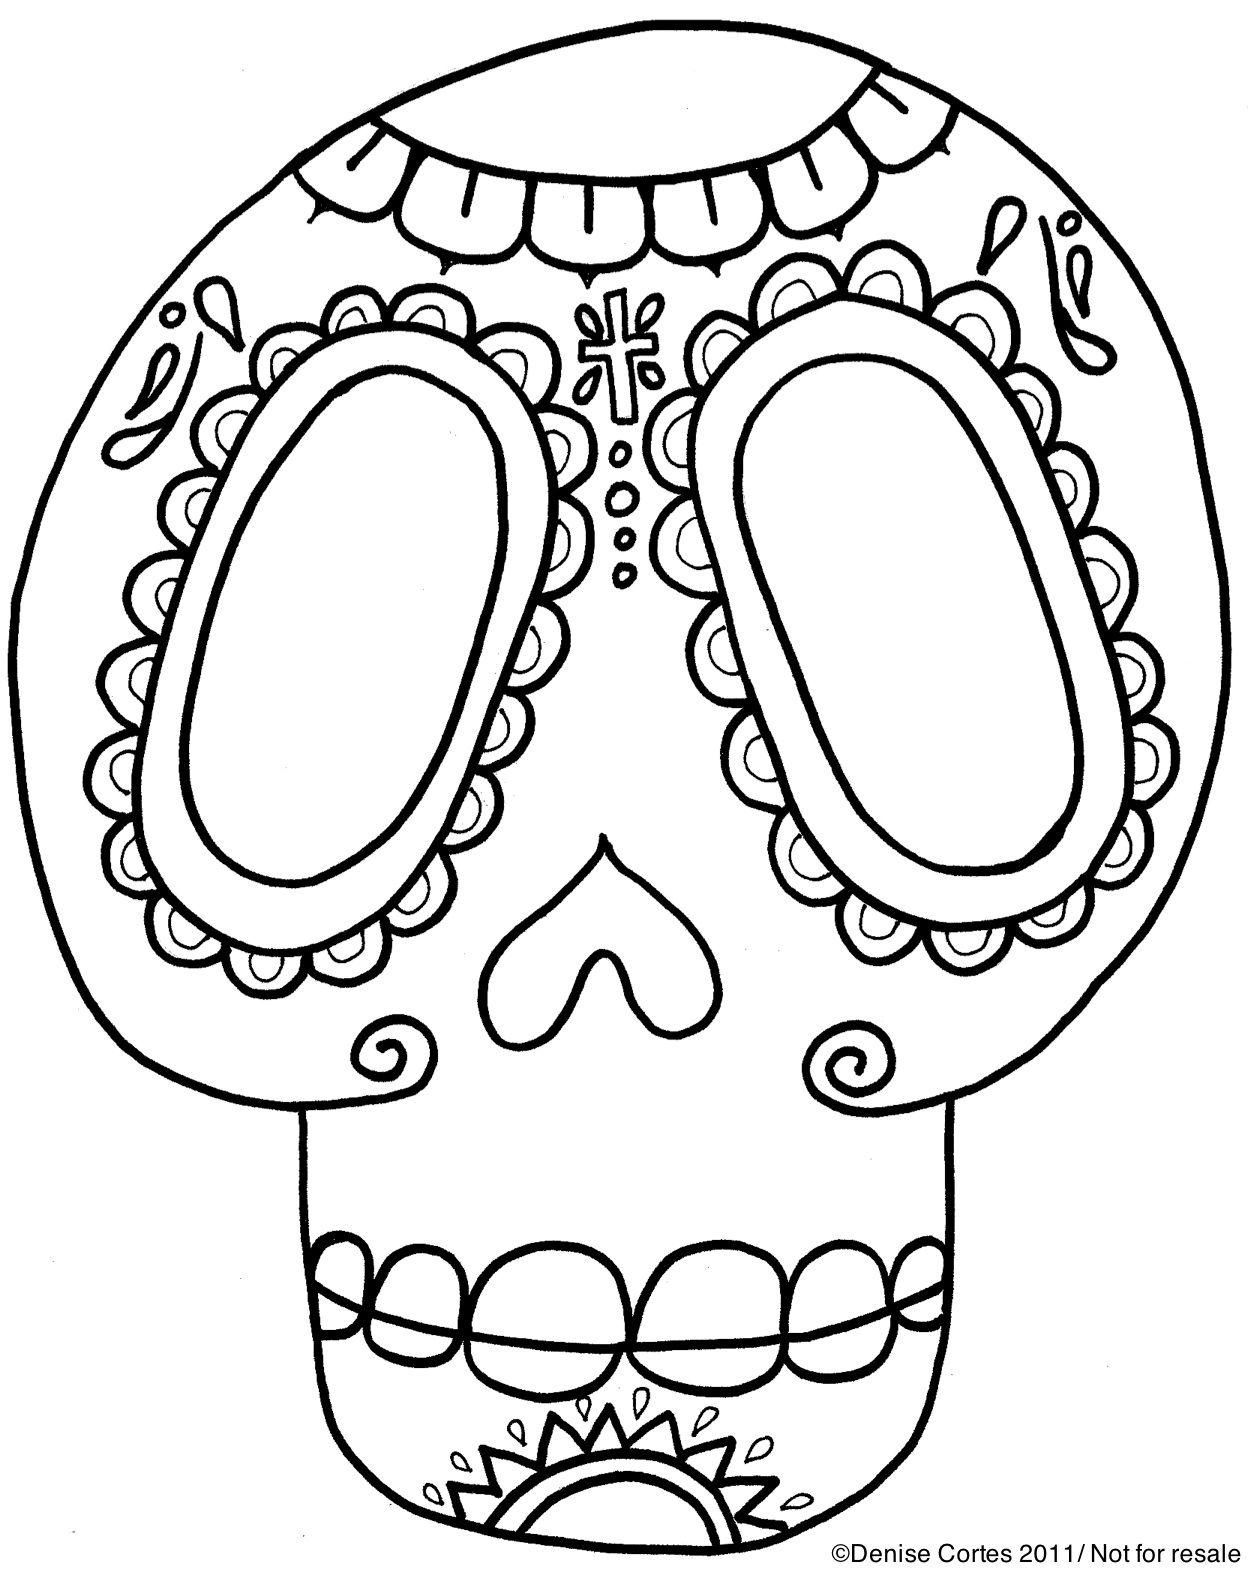 Modern Art 4 Kids: Free Día de los Muertos Printable | Art Projects ...